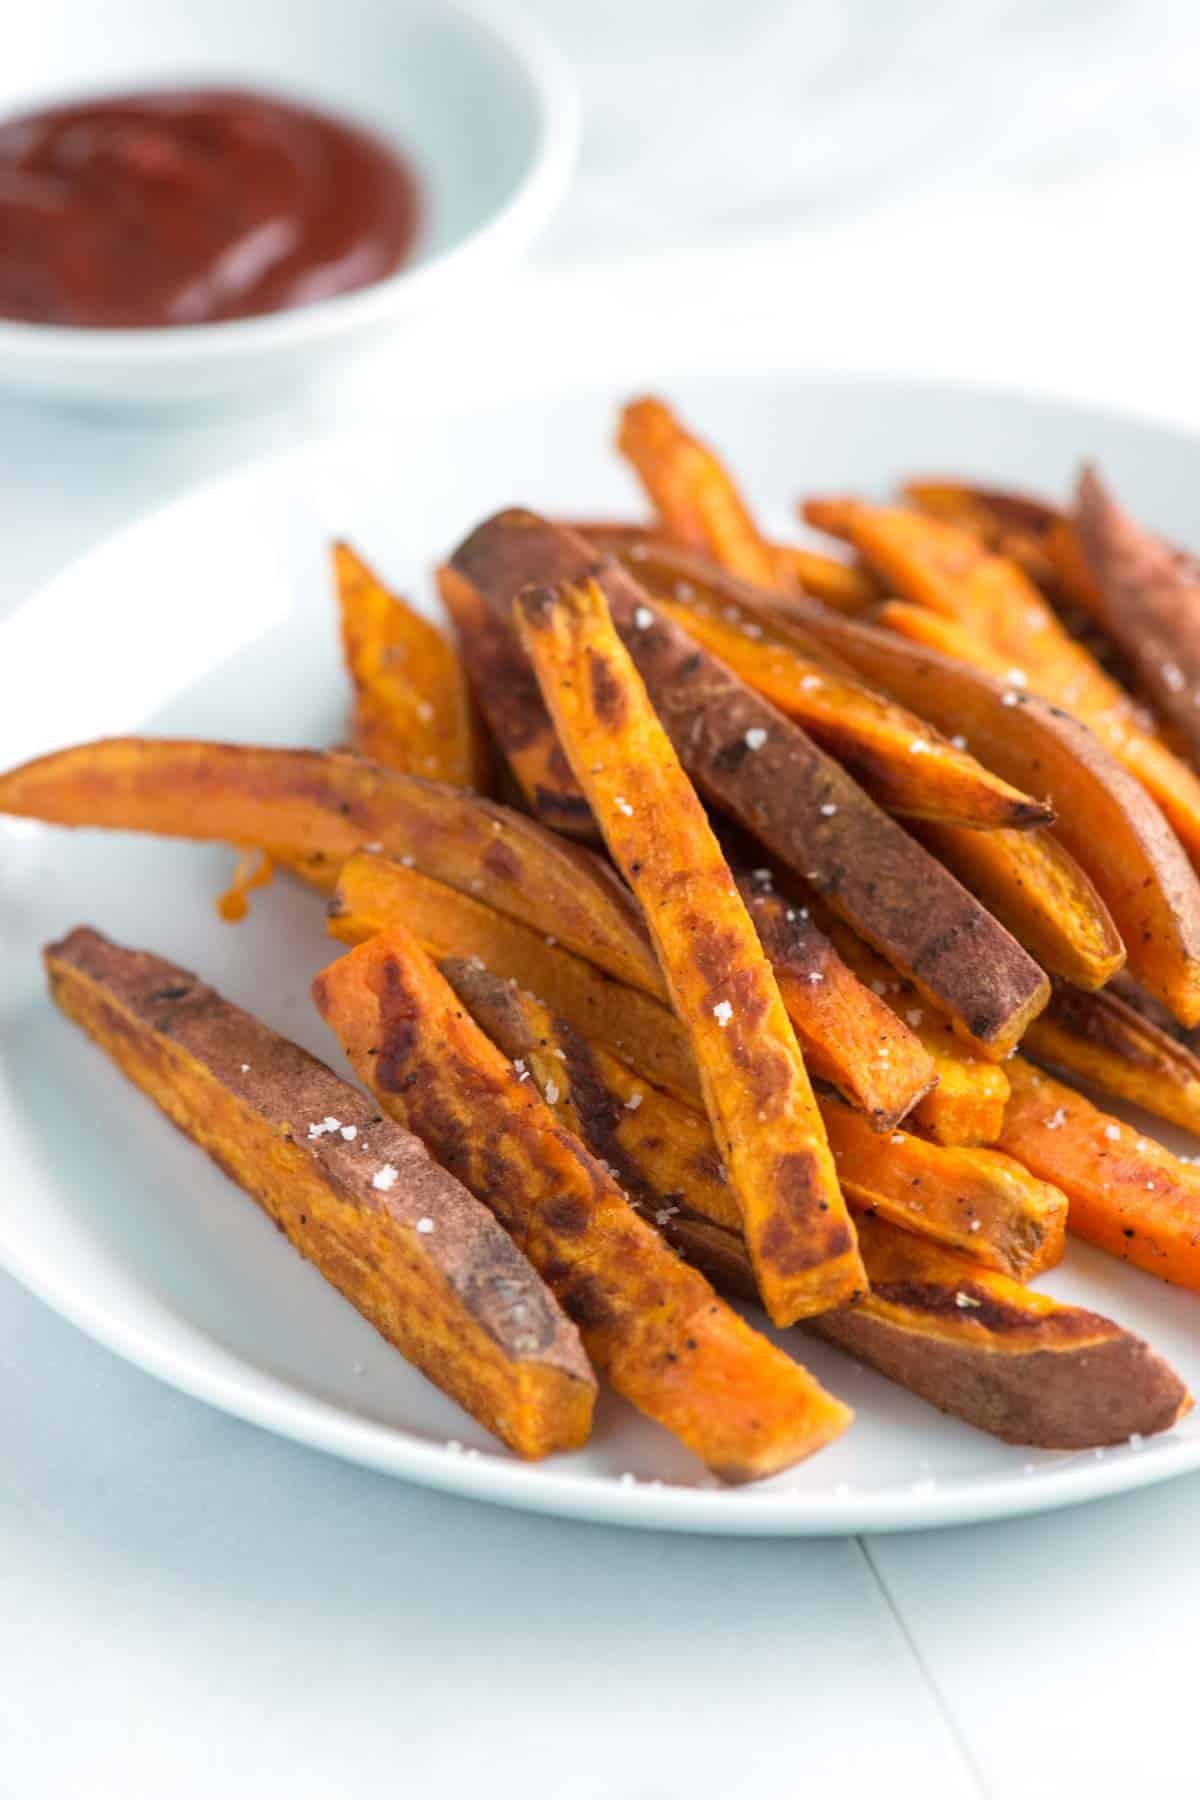 How To Cook A Sweet Potato  Easy Homemade Baked Sweet Potato Fries Recipe